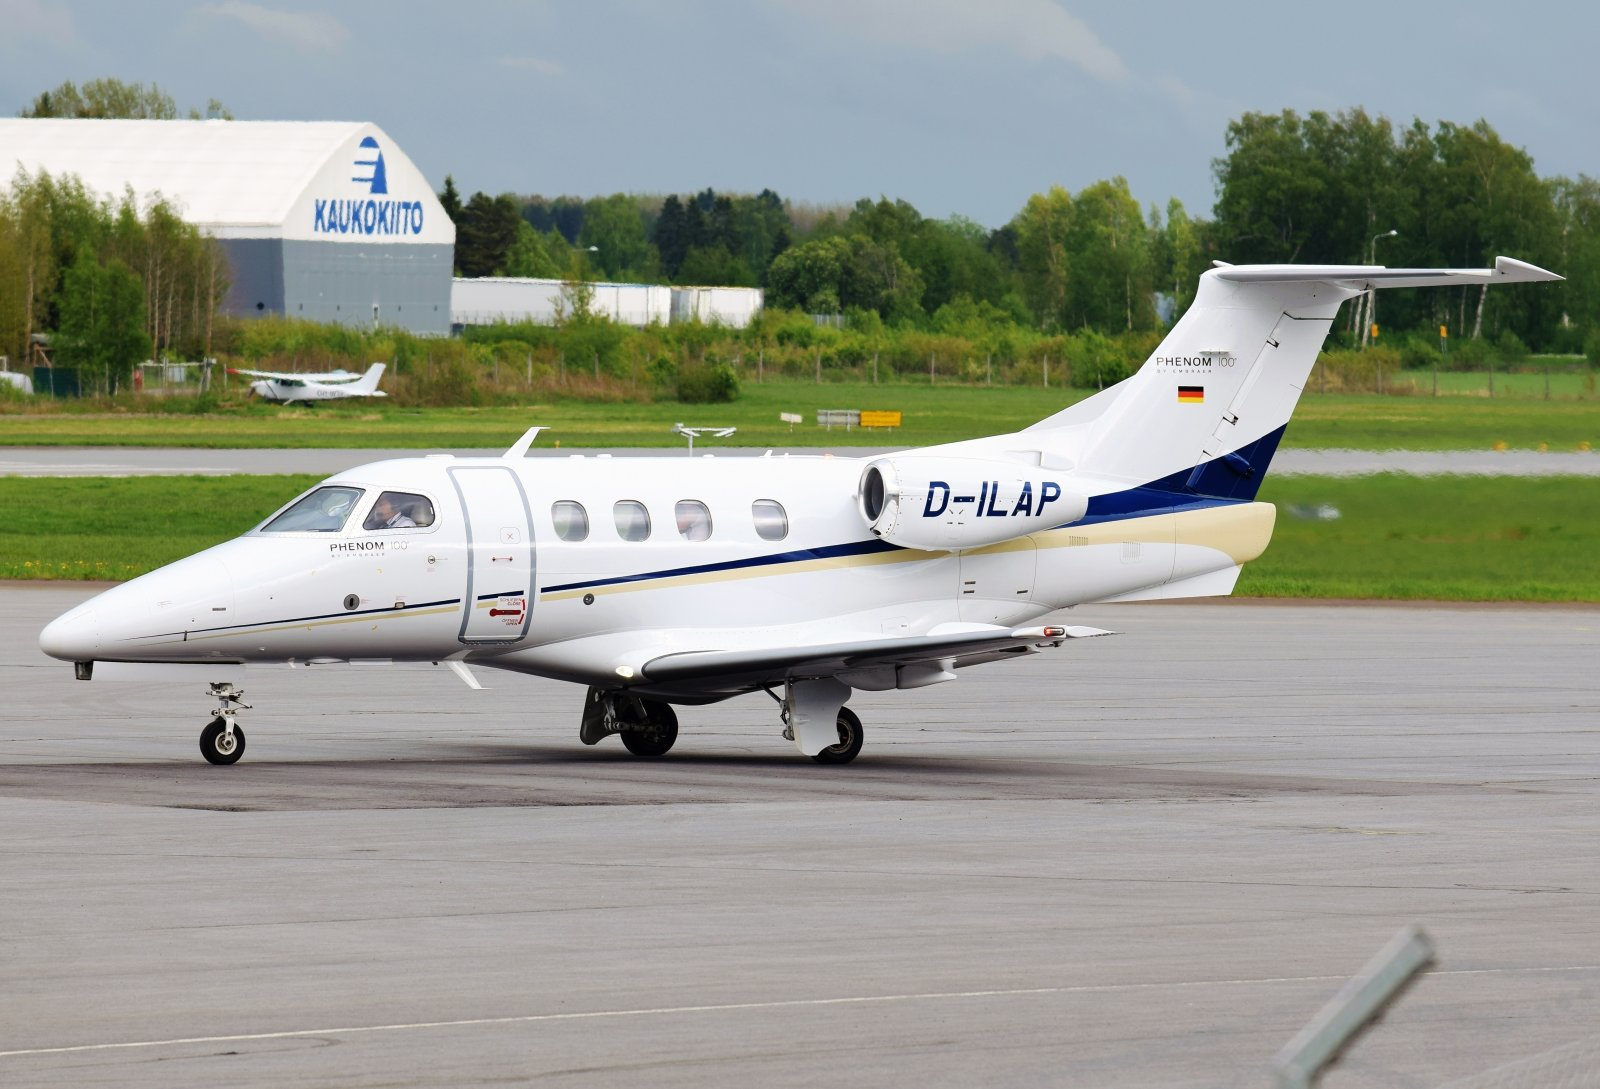 D-ILAP - Embraer EMB-500 Phenom 100 - 28.5.2019